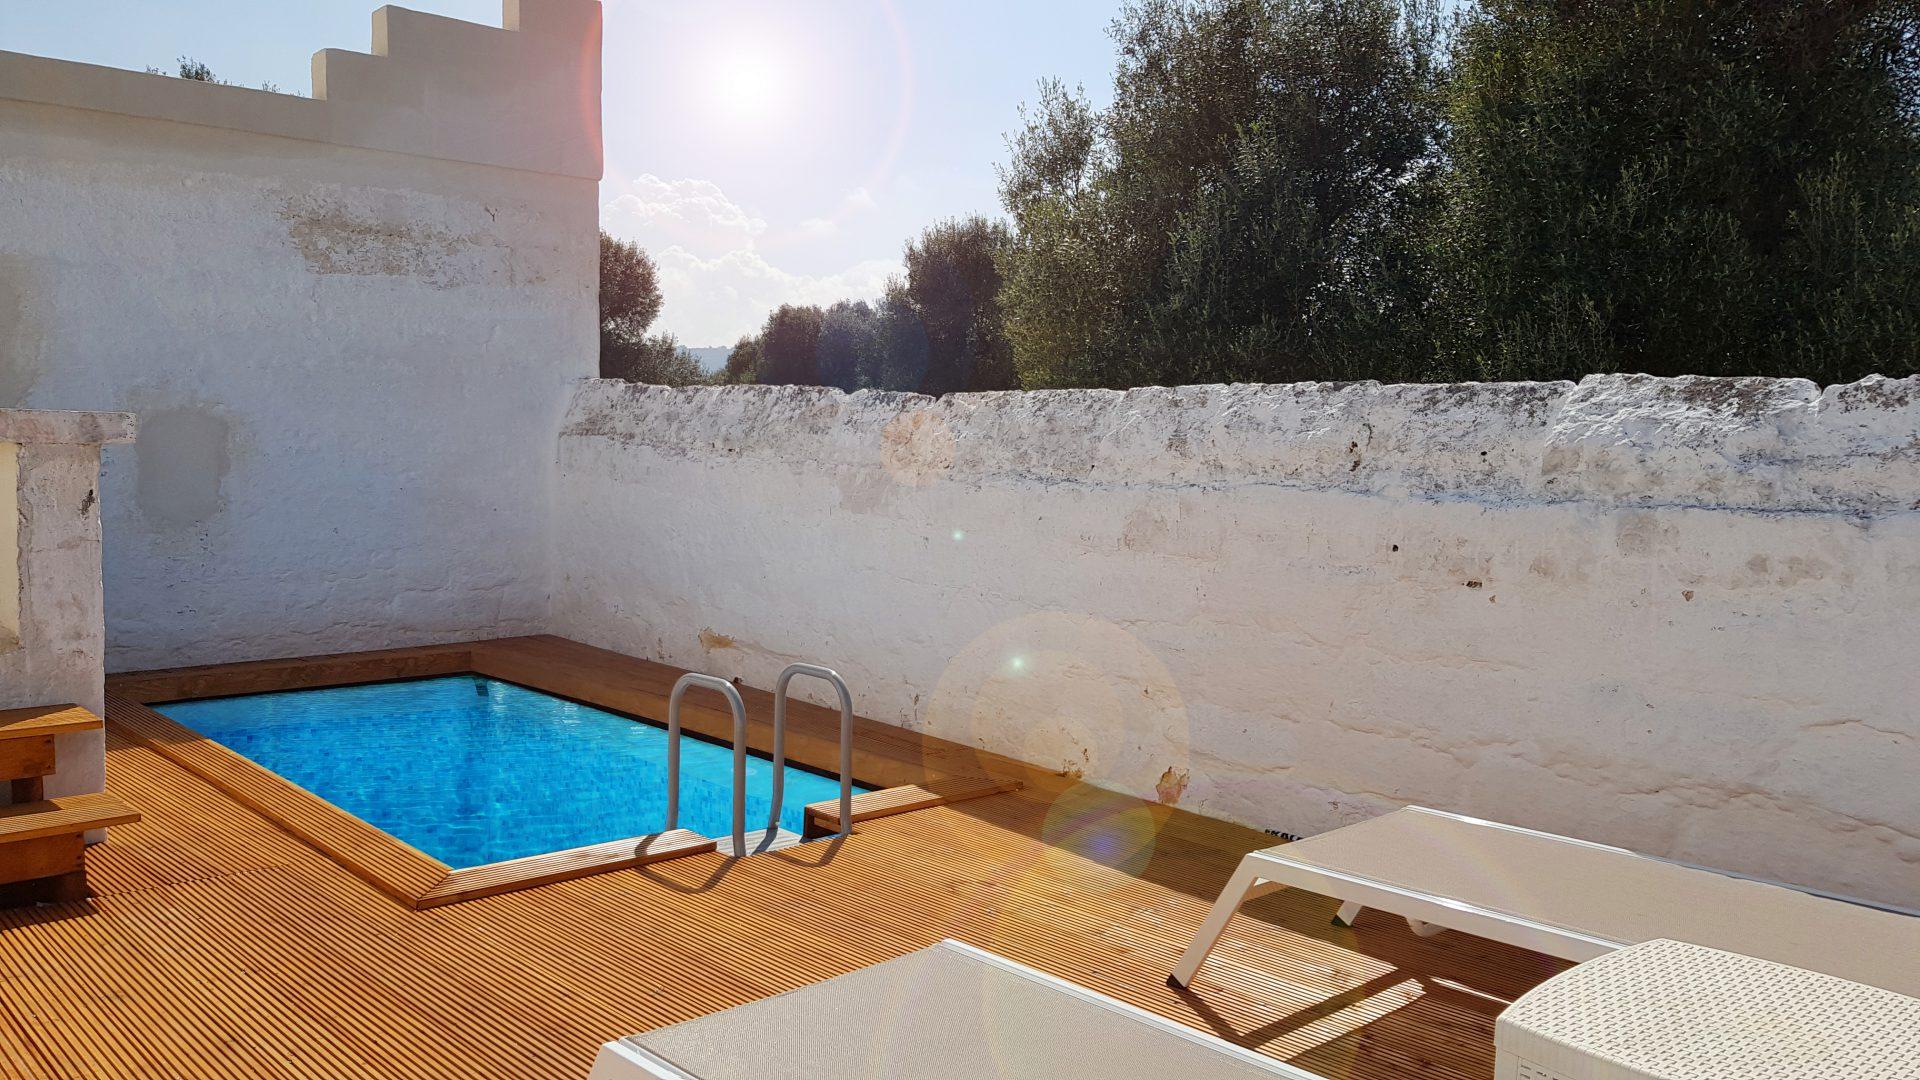 Pool at Masseria Bellavista historic holiday vacation rental villa in ostuni puglia seaview